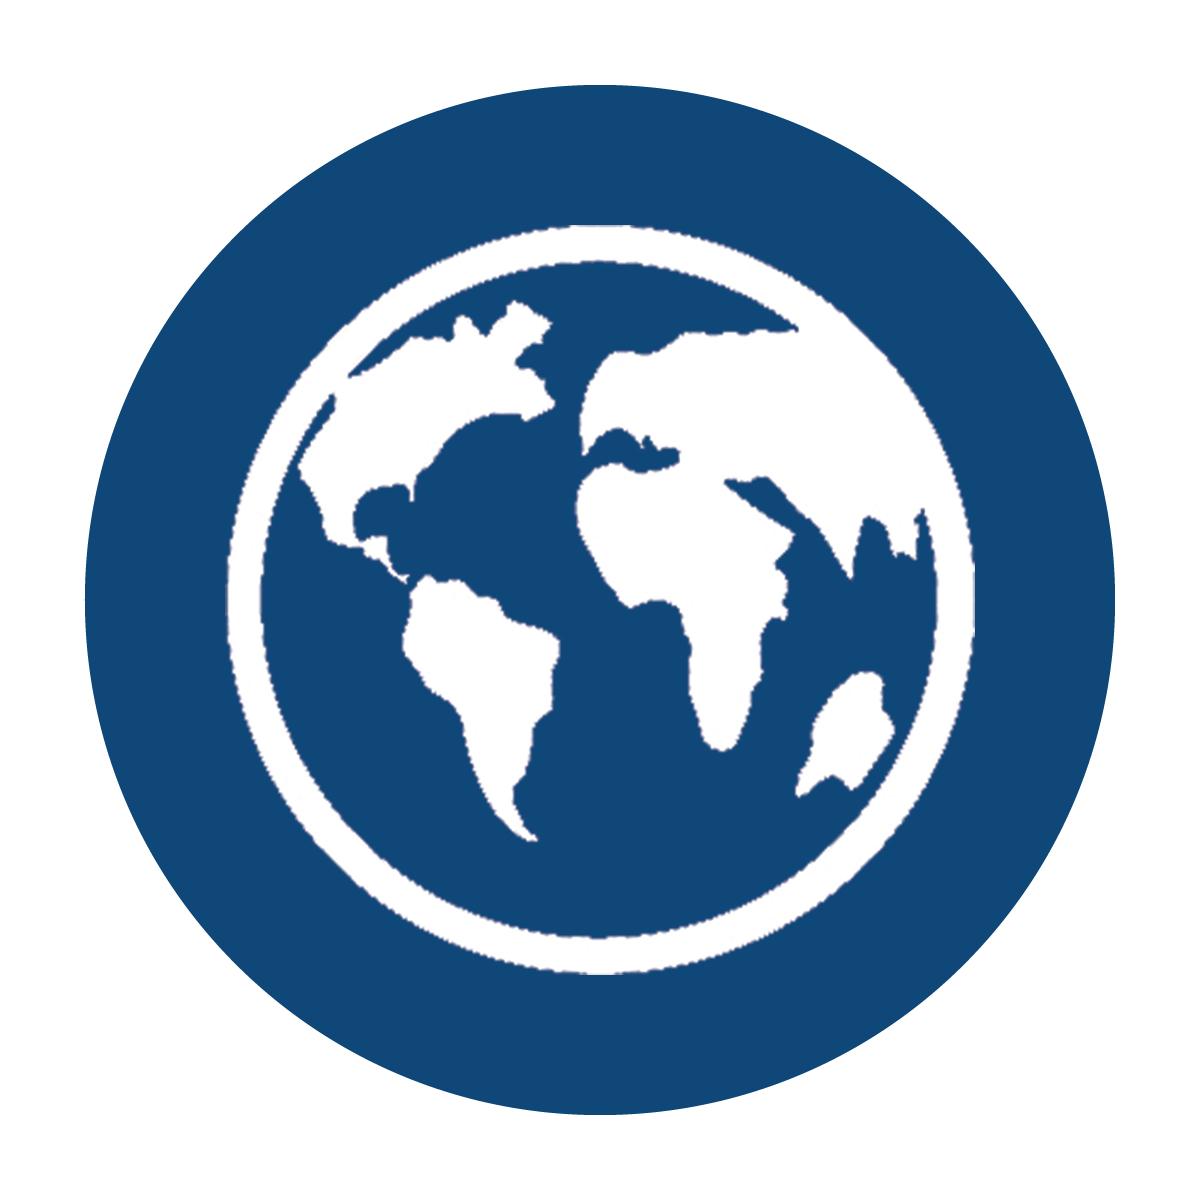 Globe Icon_dark blue.jpg